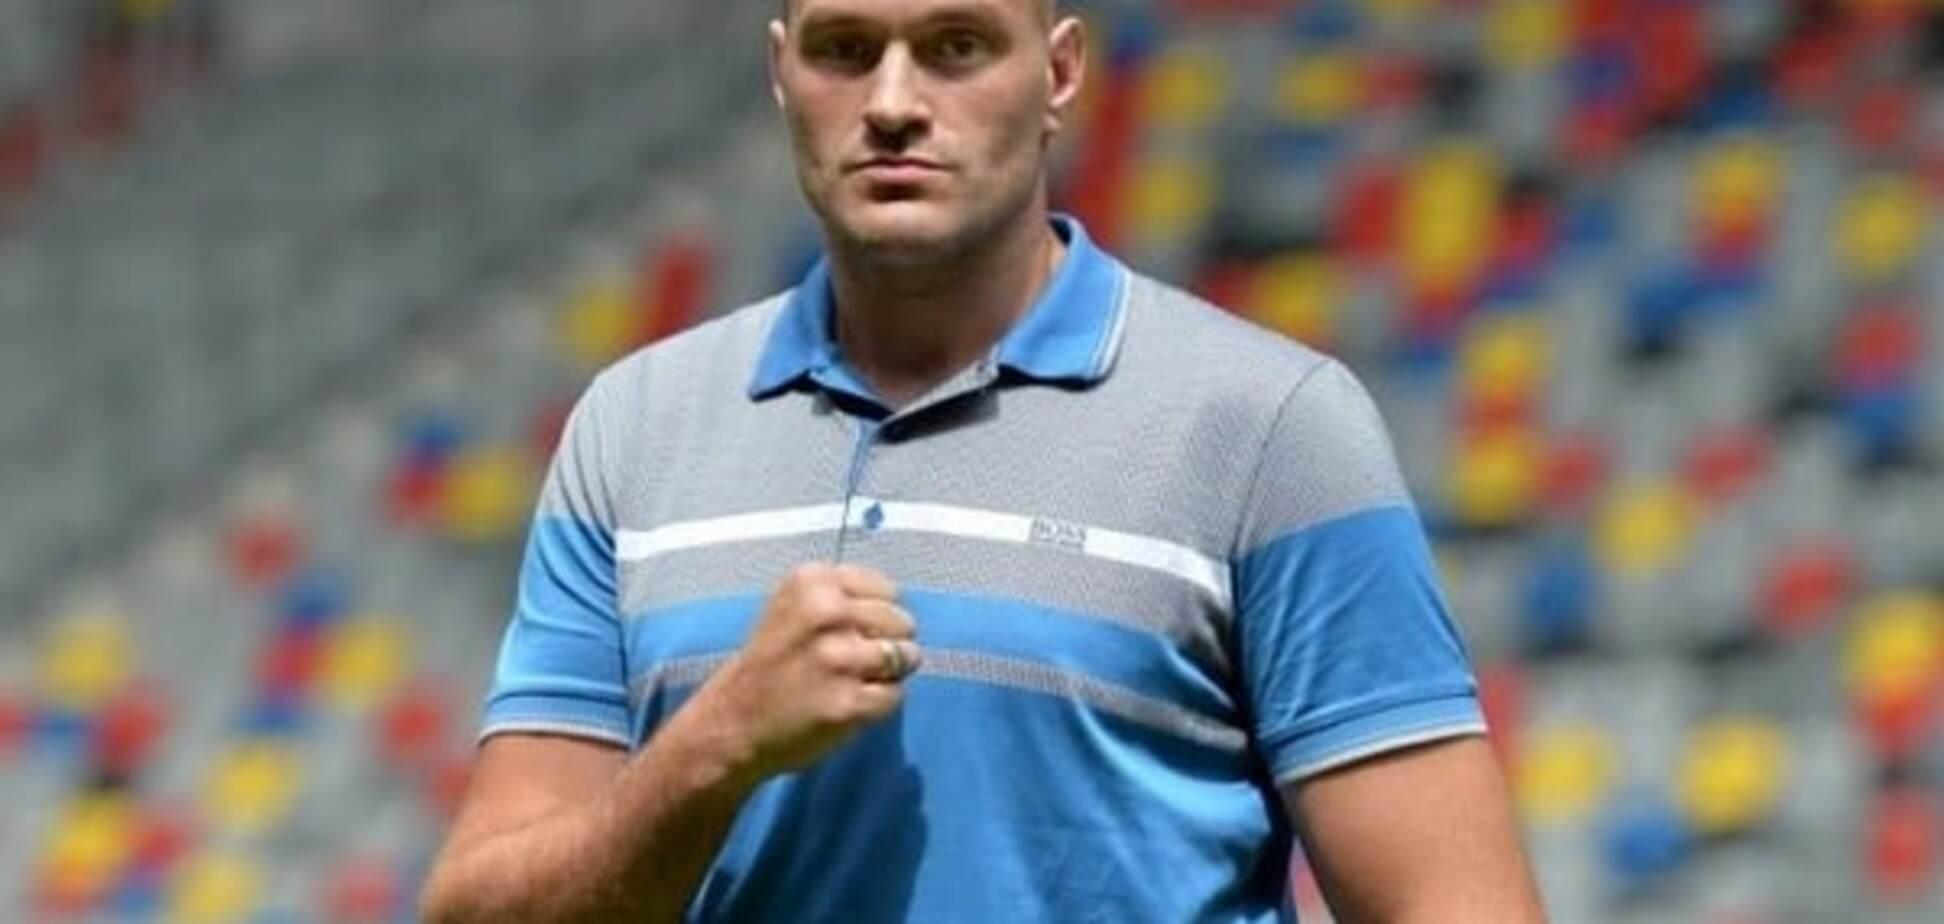 Названа причина отмены реванша Кличко - Фьюри